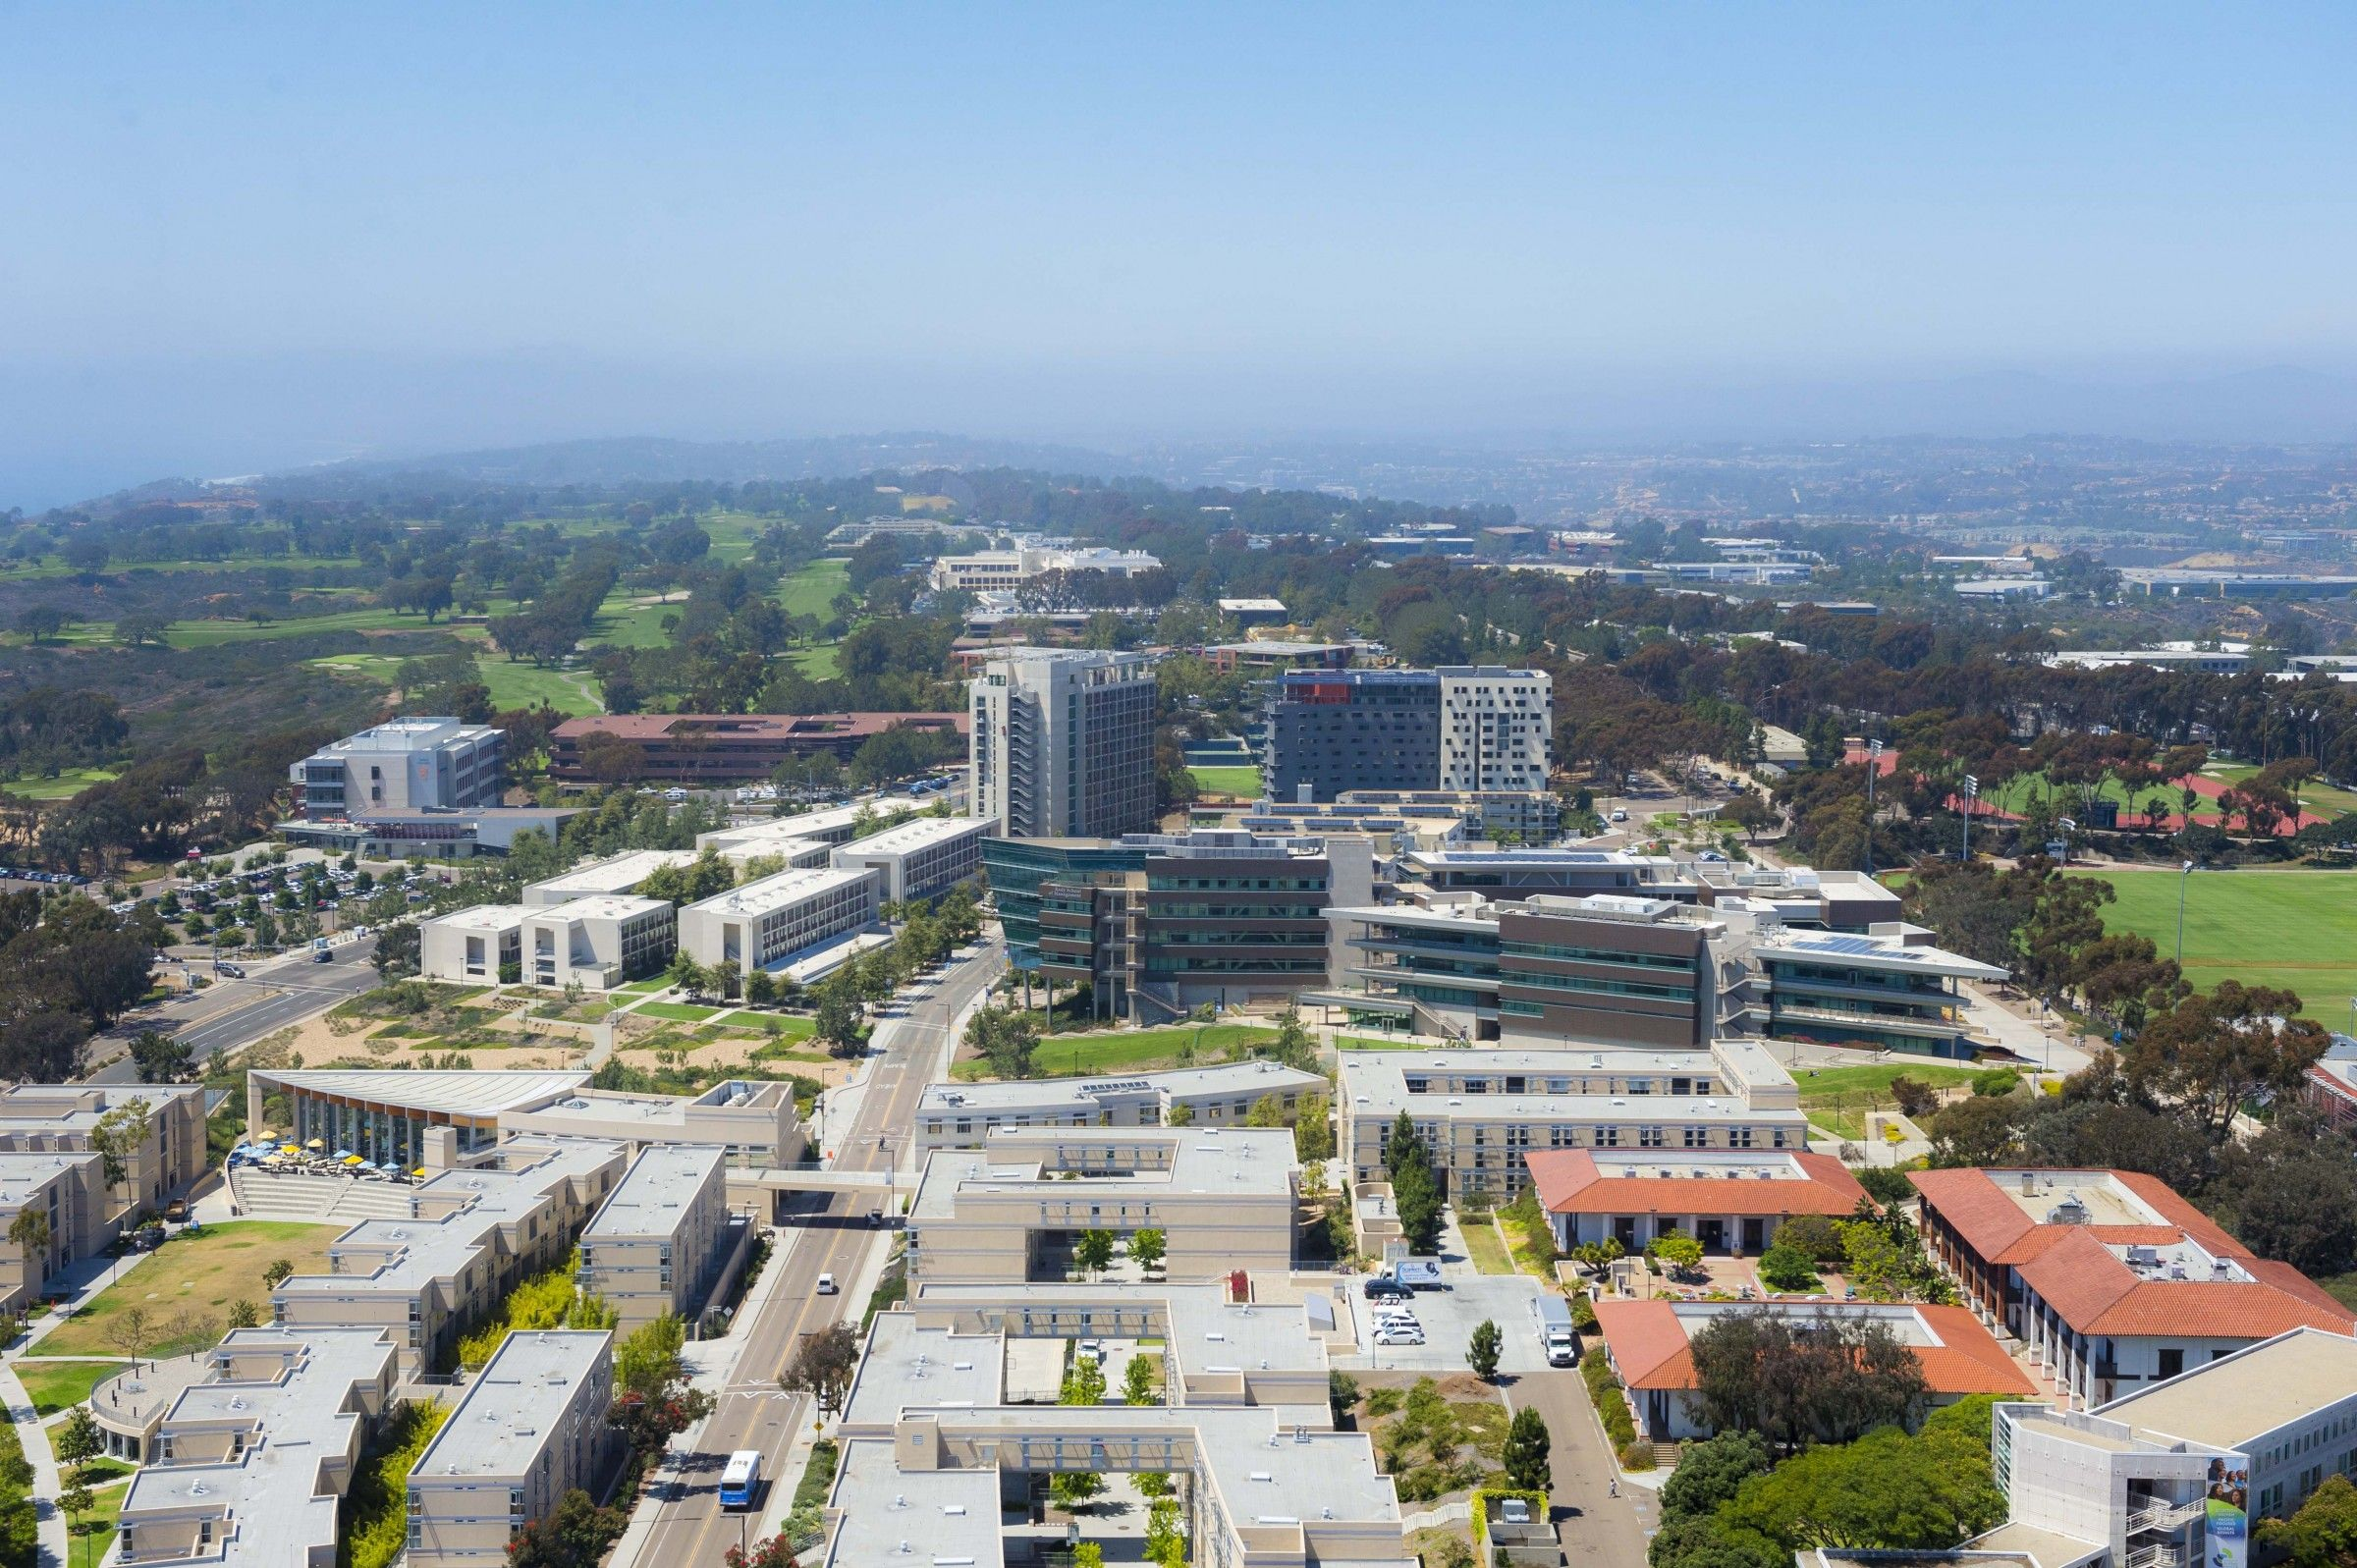 Aerial View Of Uc San Diego North Campus North Campus College Campus Campus